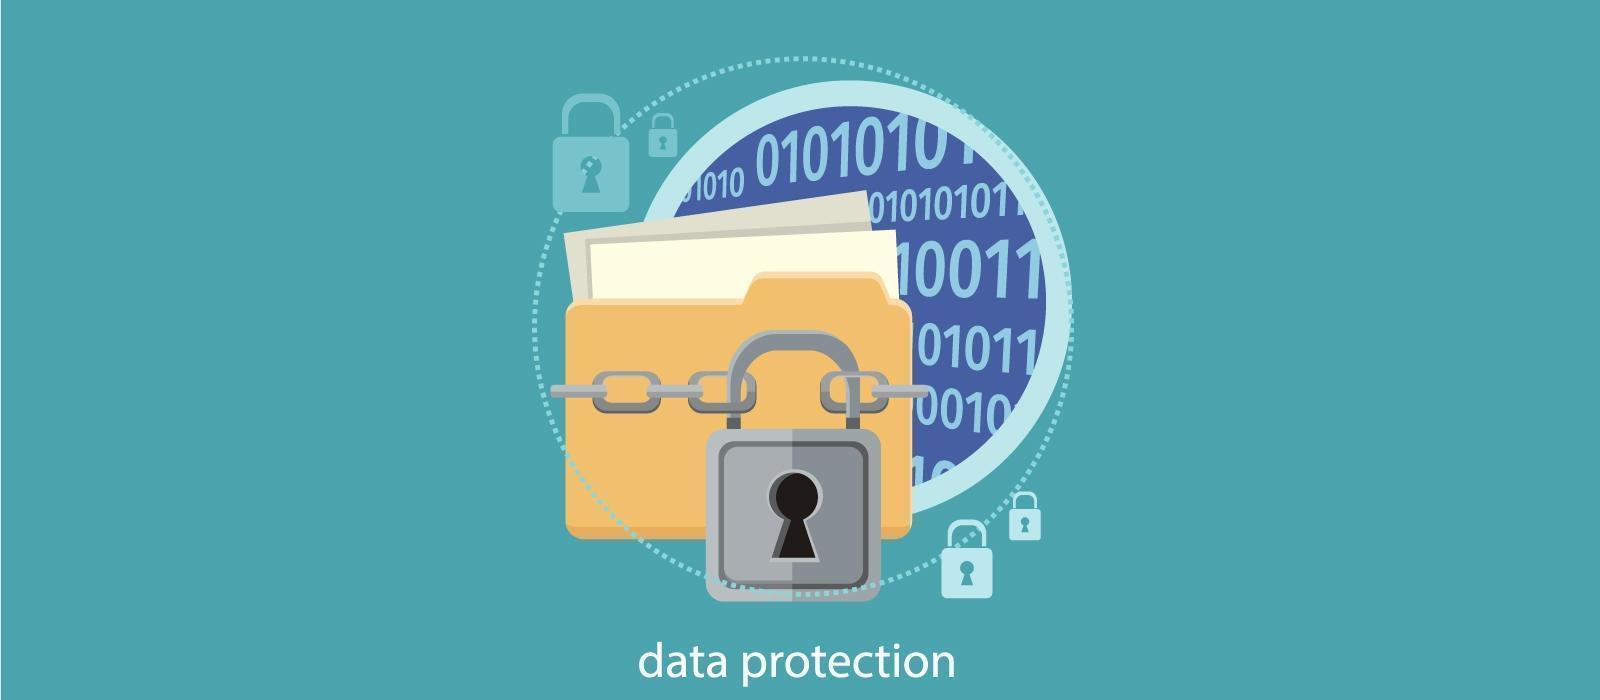 b6947d66e6a Οι Αρχές Προστασίας Δεδομένων στα κράτη-μέλη της Ευρωπαϊκής Ένωσης ...